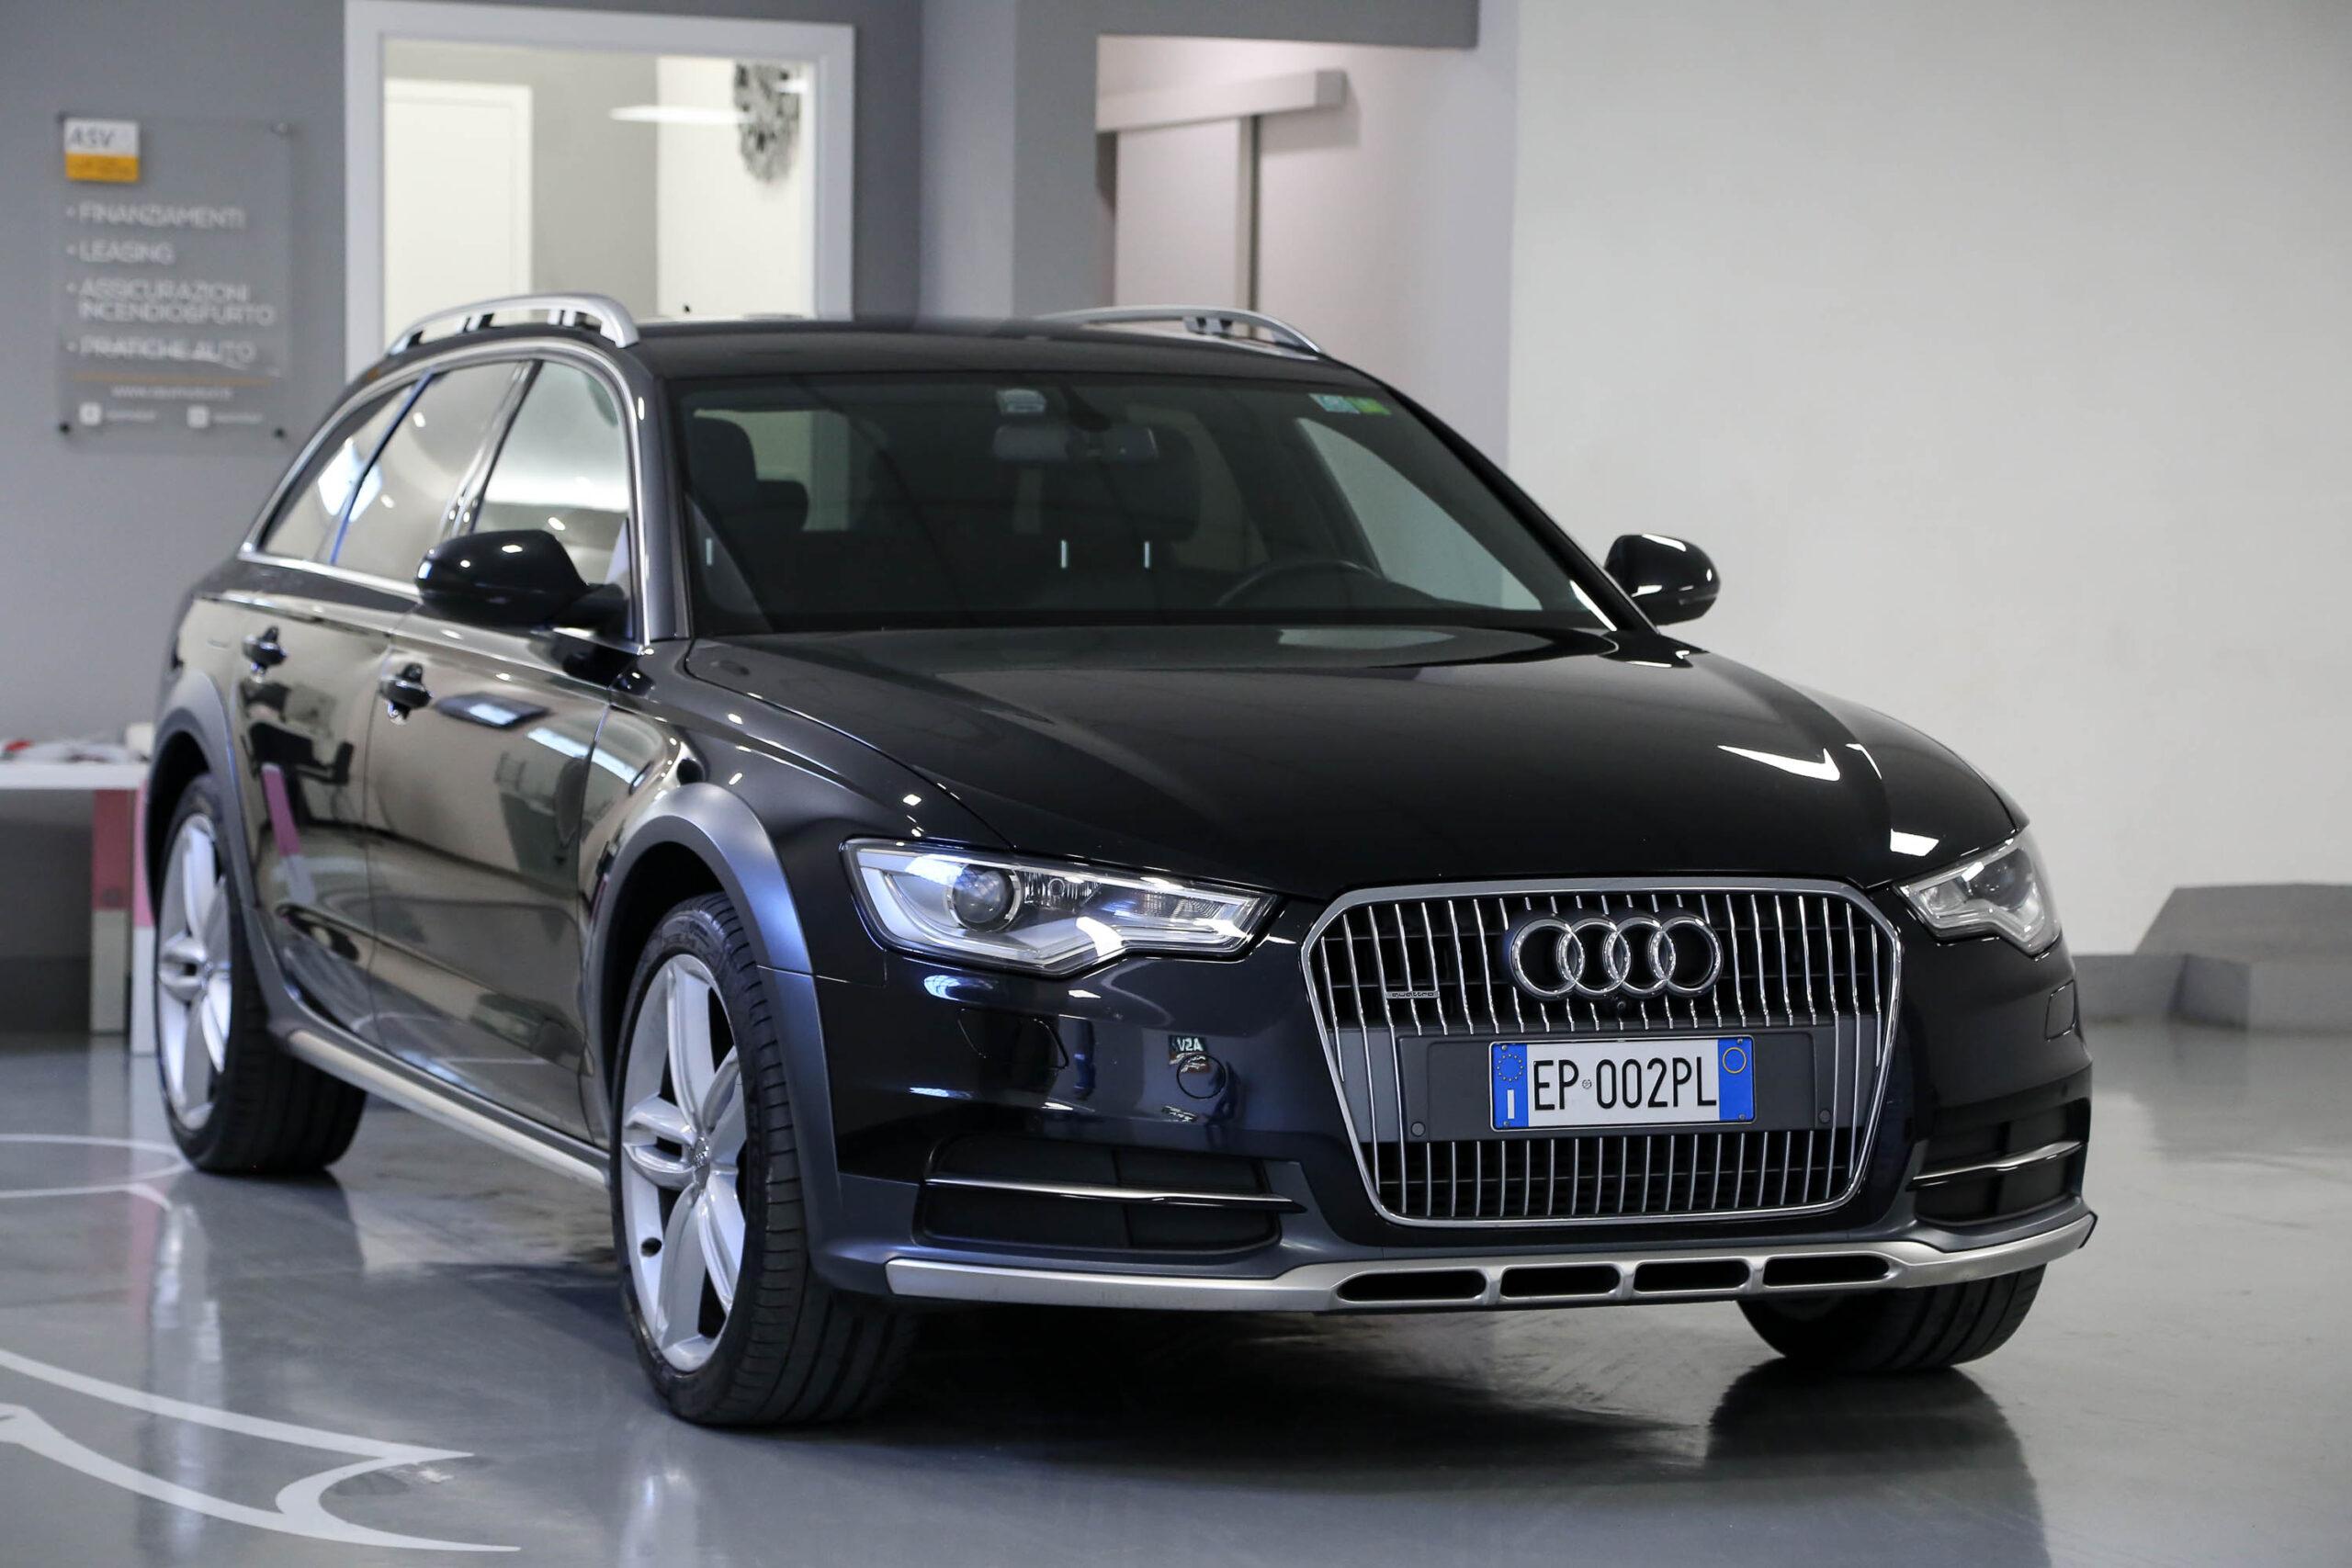 Audi A6 allroad 3.0 TDI 245 CV S tronic Advanced